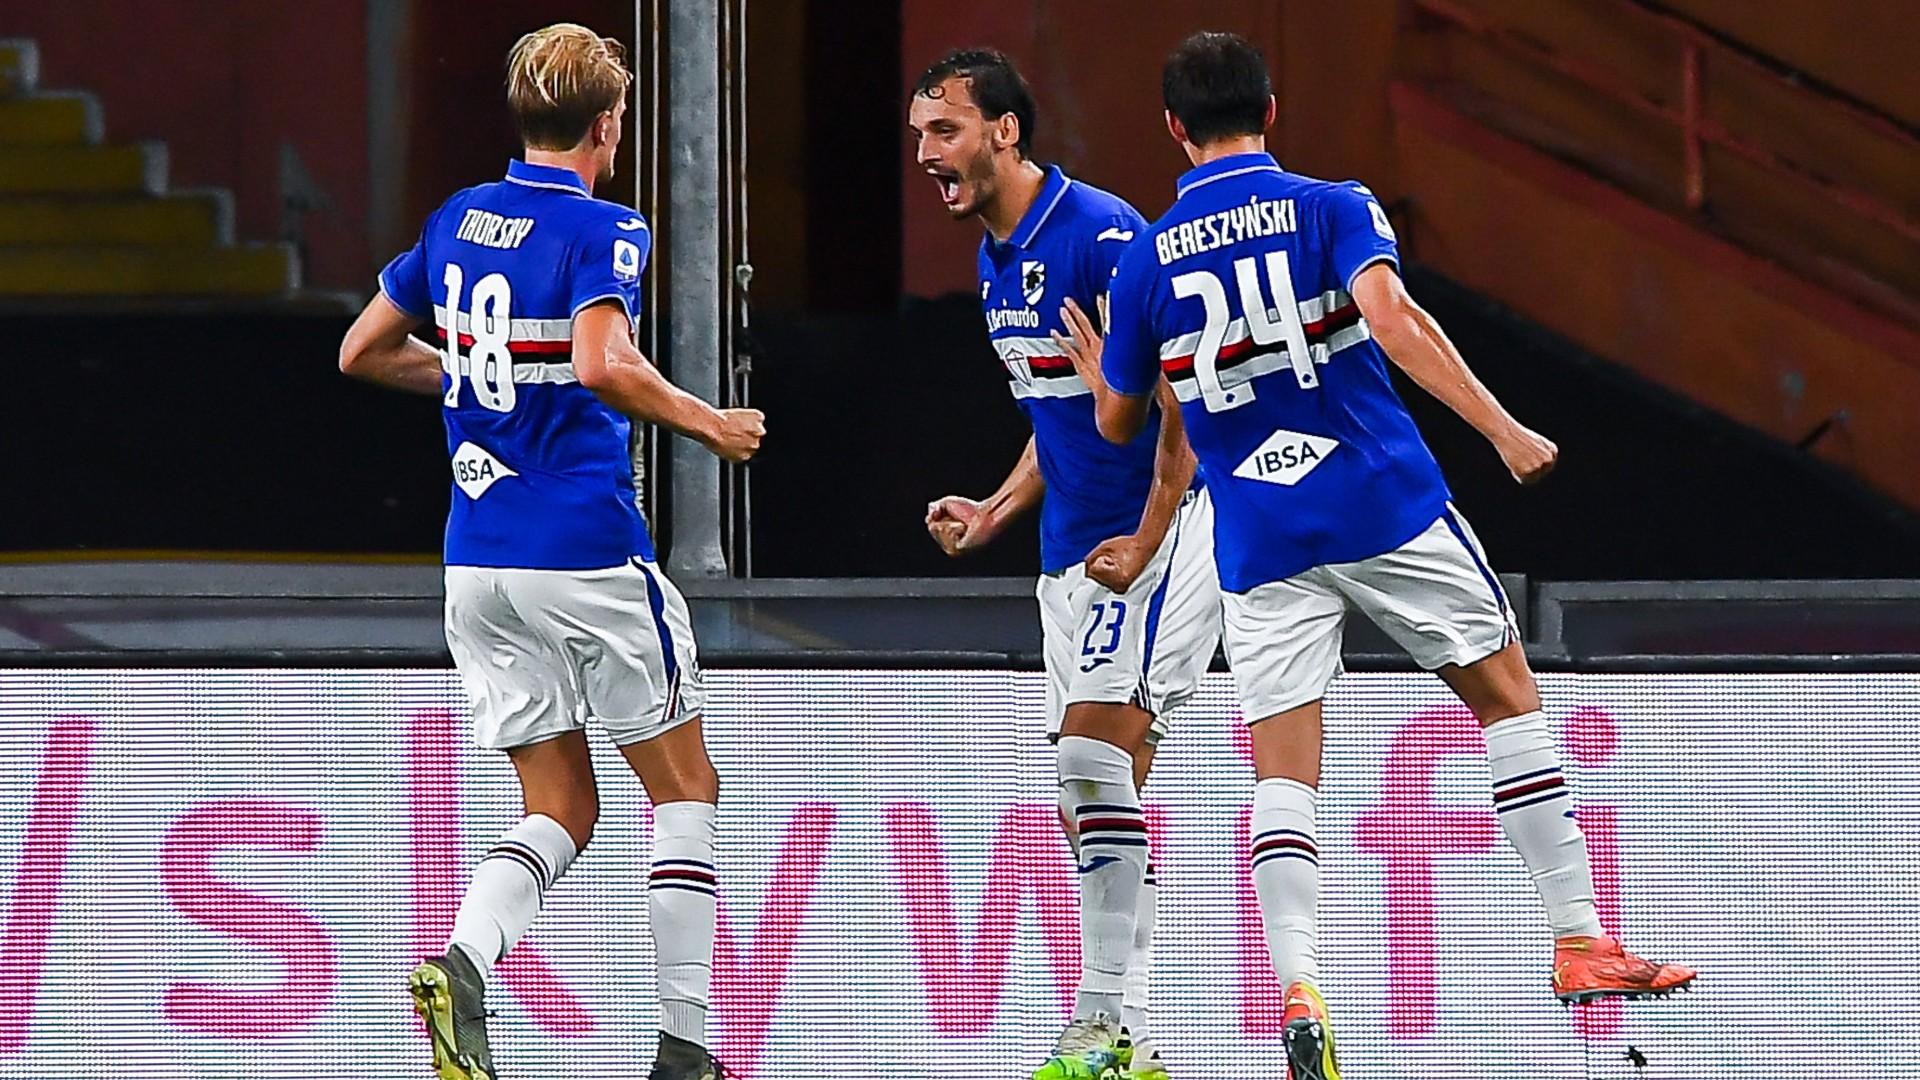 Sampdoria-Genoa 1-2 - Le foto di Sampdoria-Genoa 1-2 | Virgilio Sport